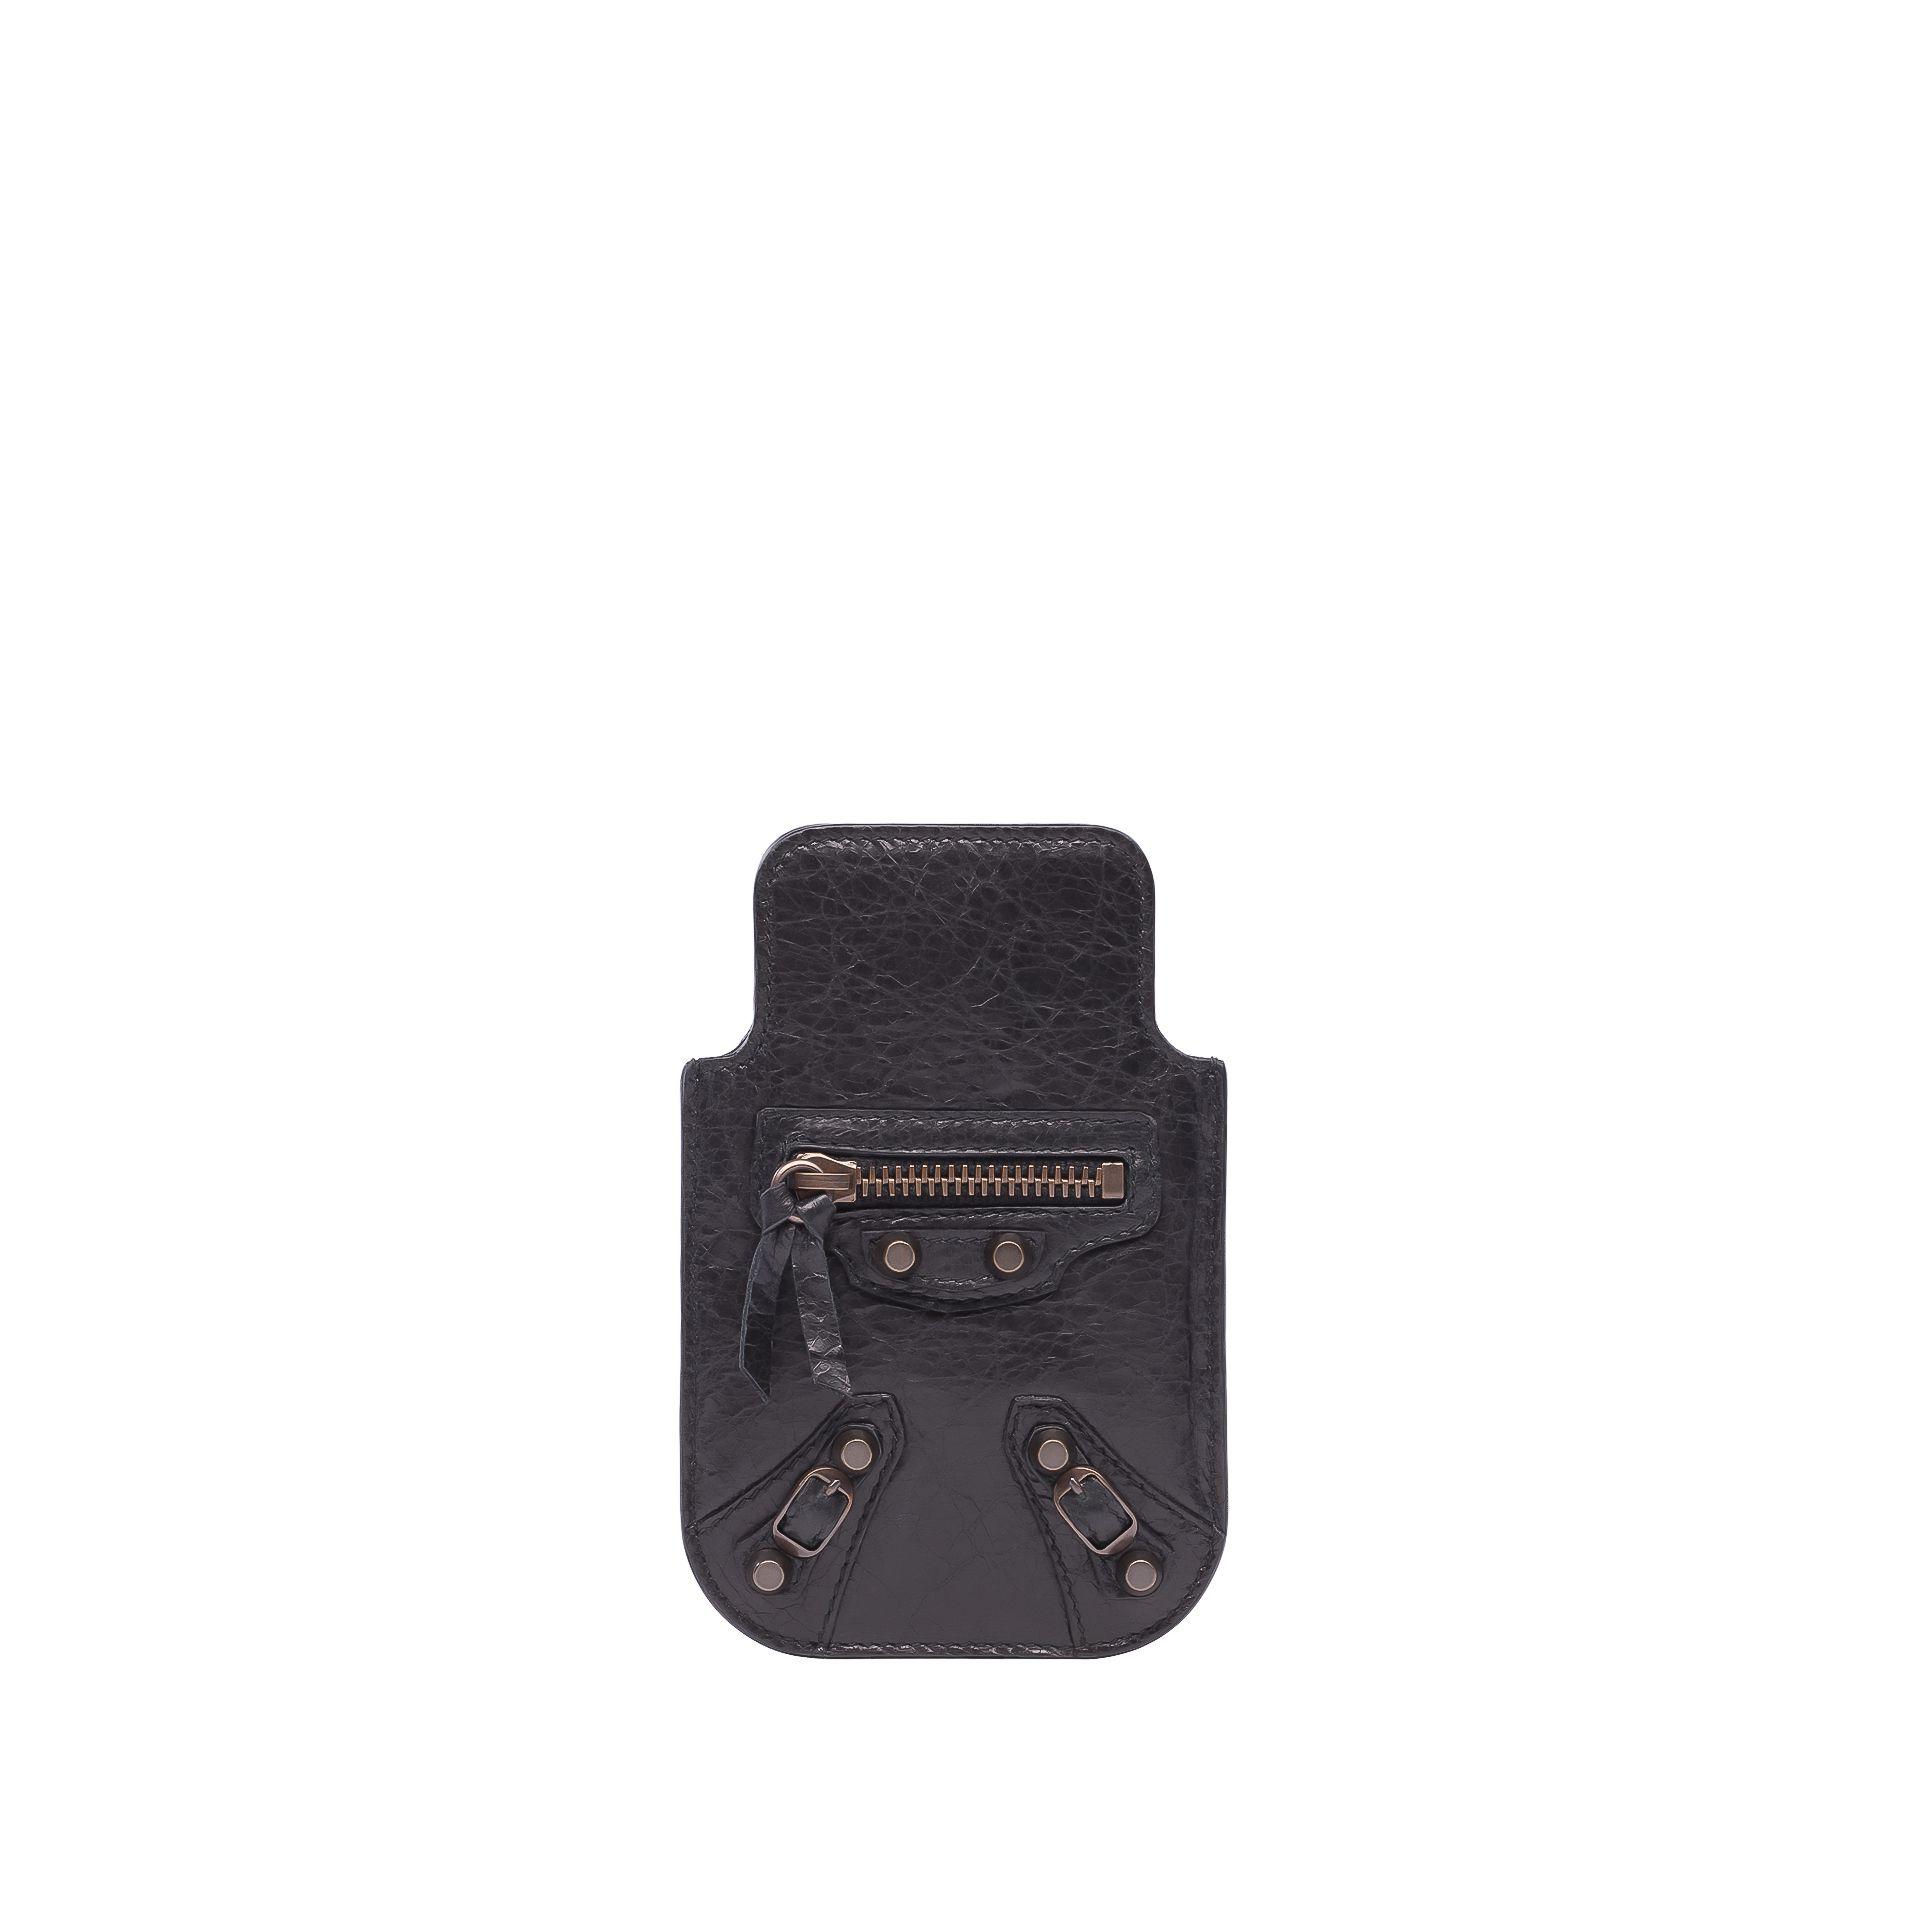 BALENCIAGA Balenciaga Classic Smart Phone Pouch Tech accessories D f